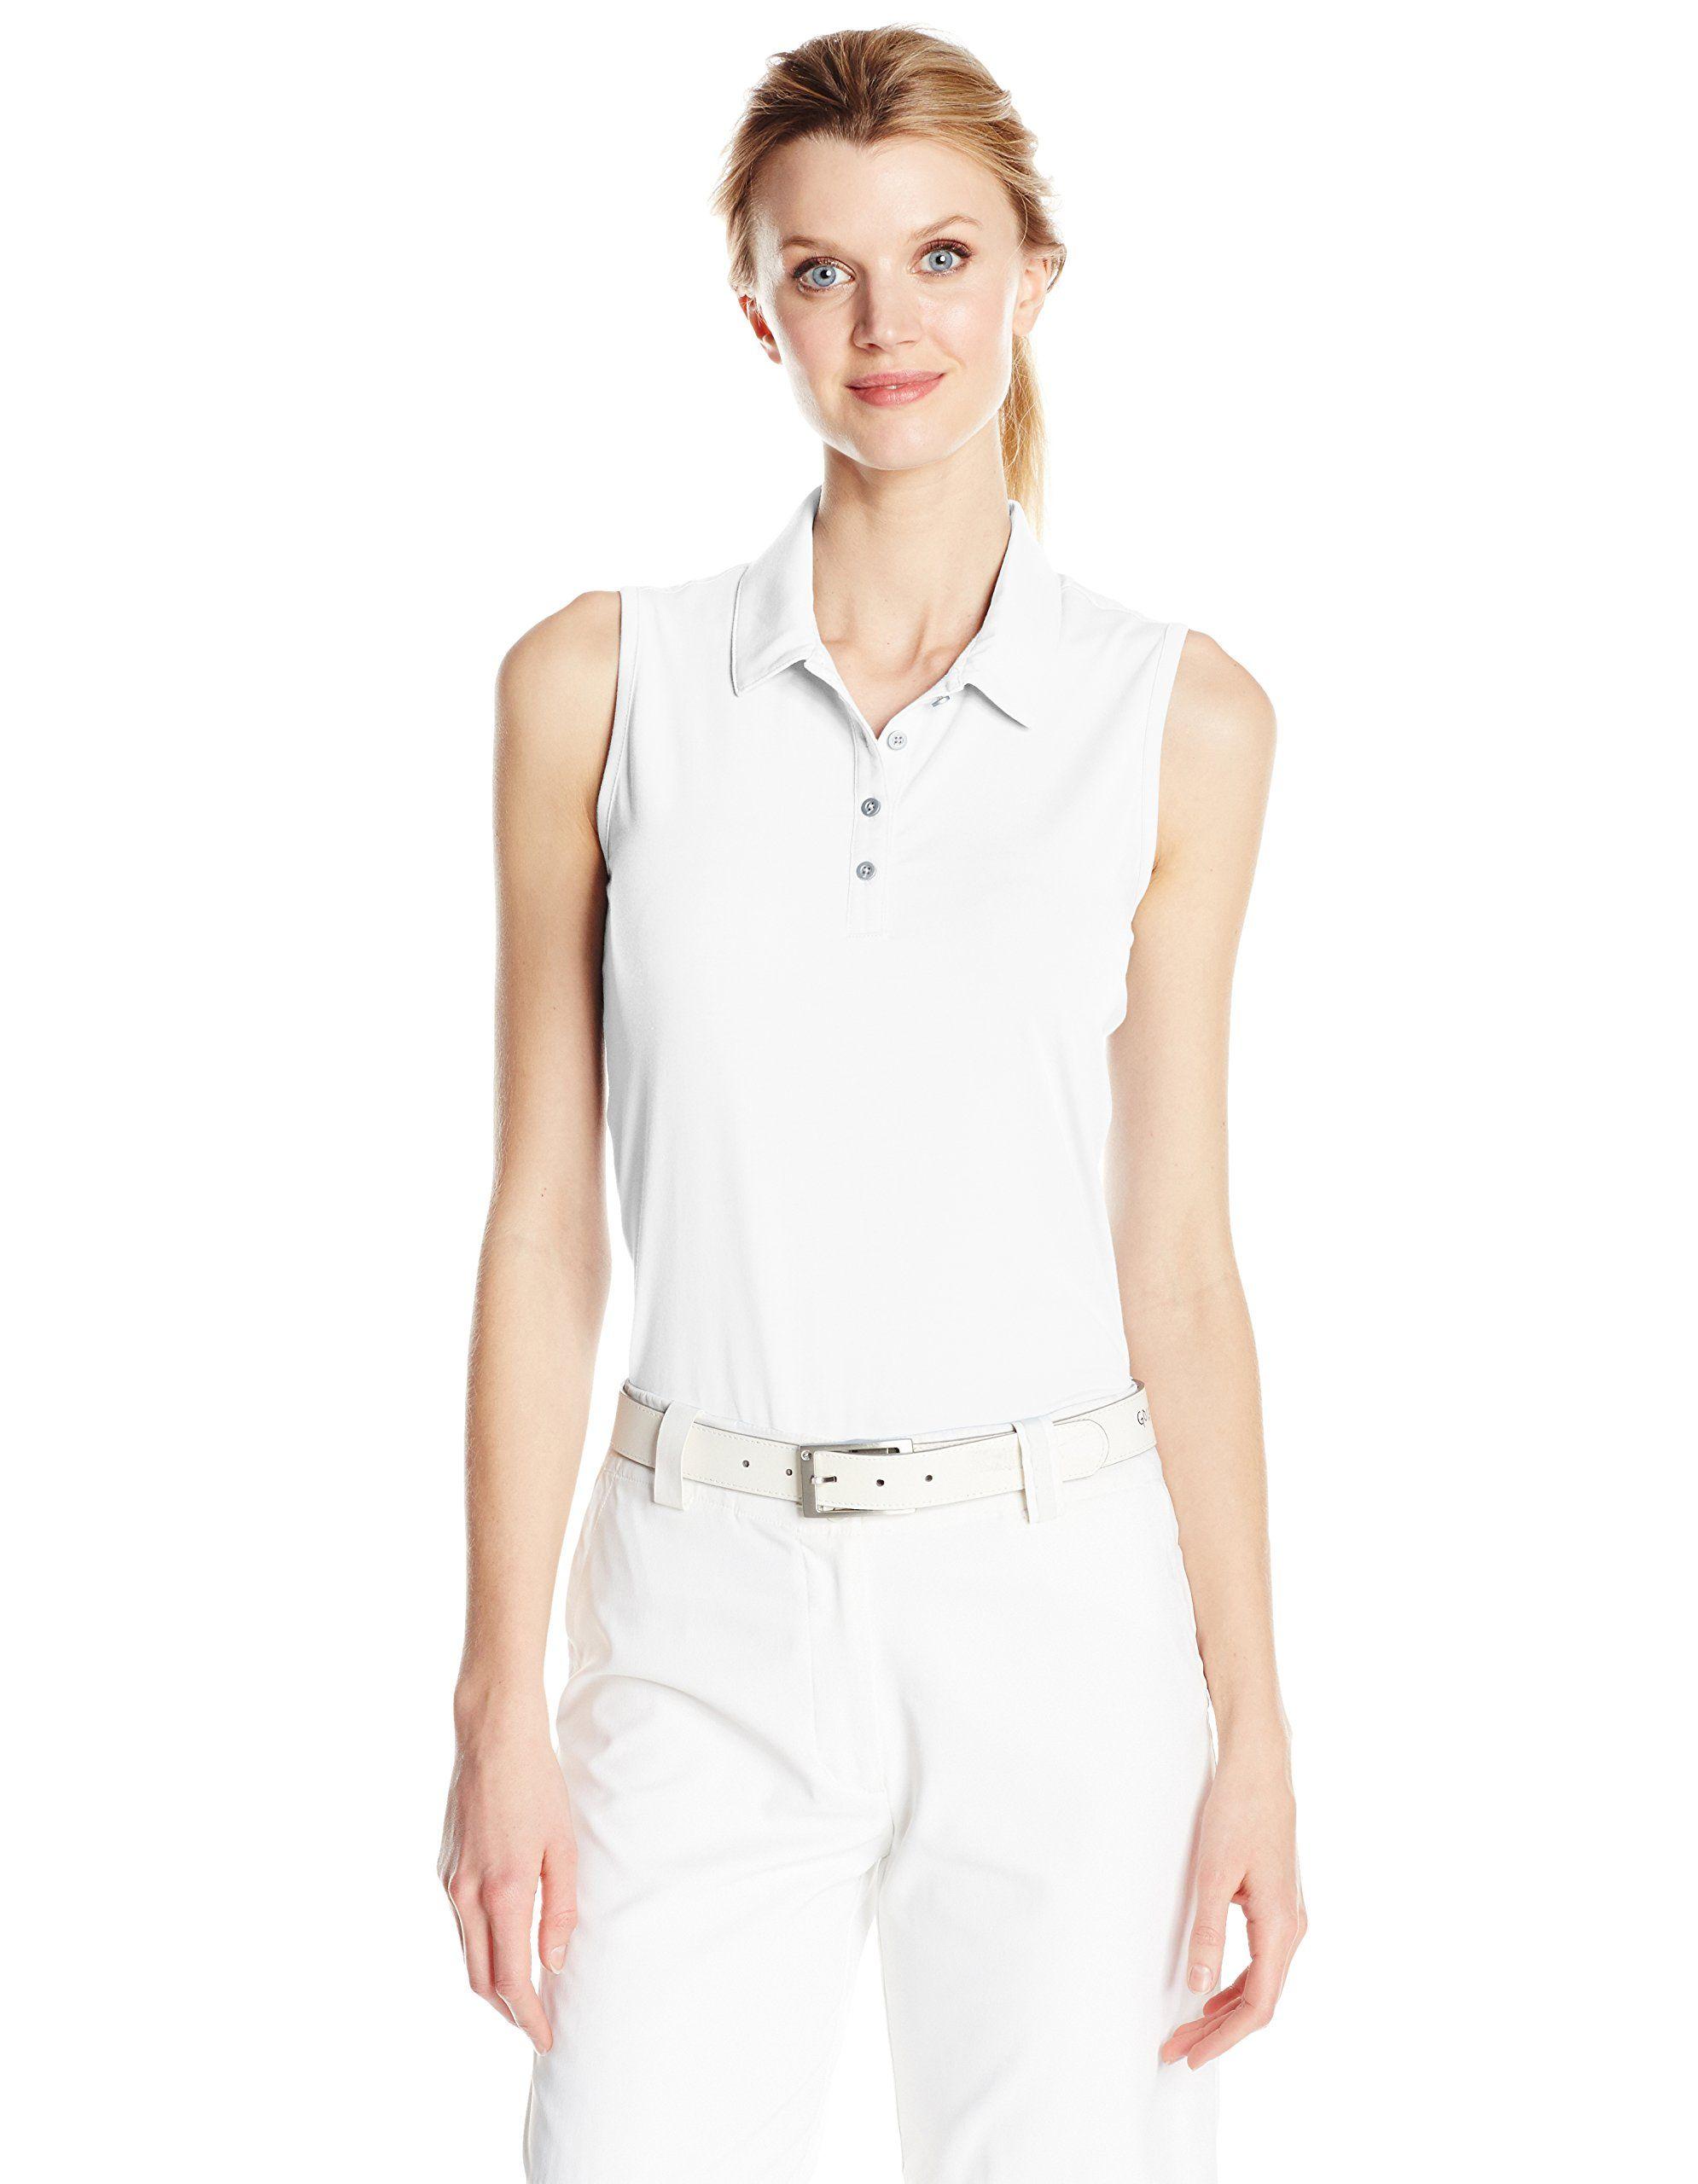 57c7951eab6d72 Women Golf Clothing - adidas Golf Womens Essentials Cotton Sleeveless Tee  White XLarge